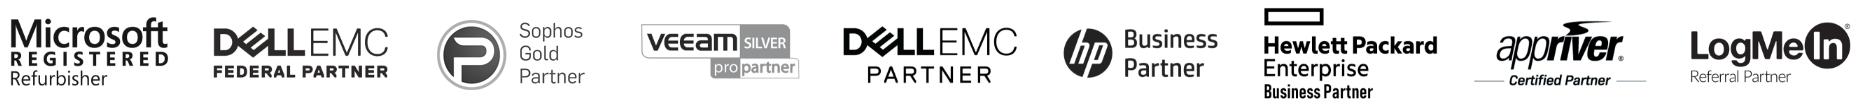 partner-logo-banner-bottom.png